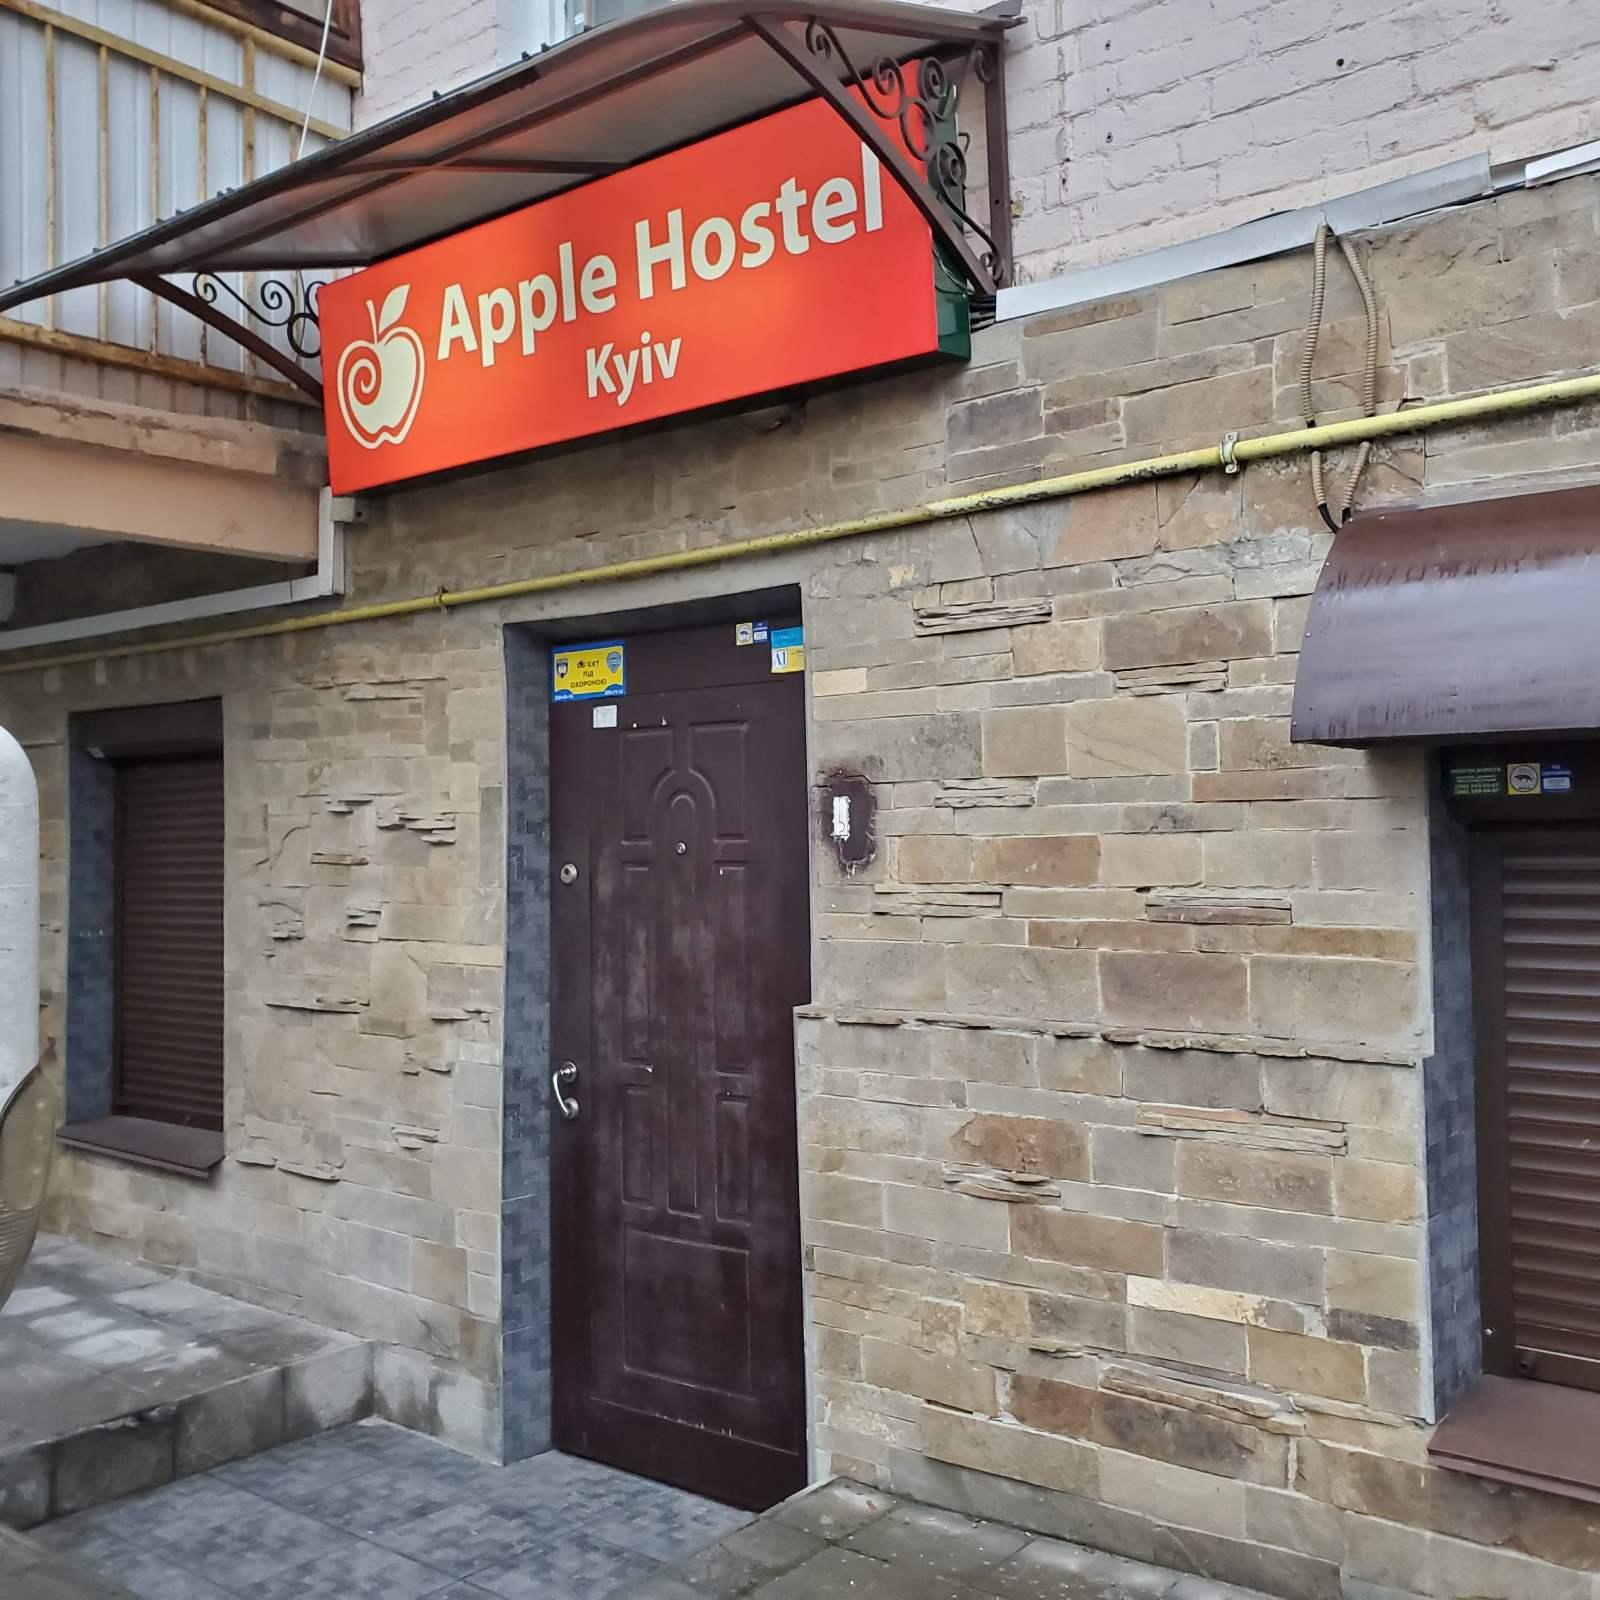 Apple Hostel Kyiv